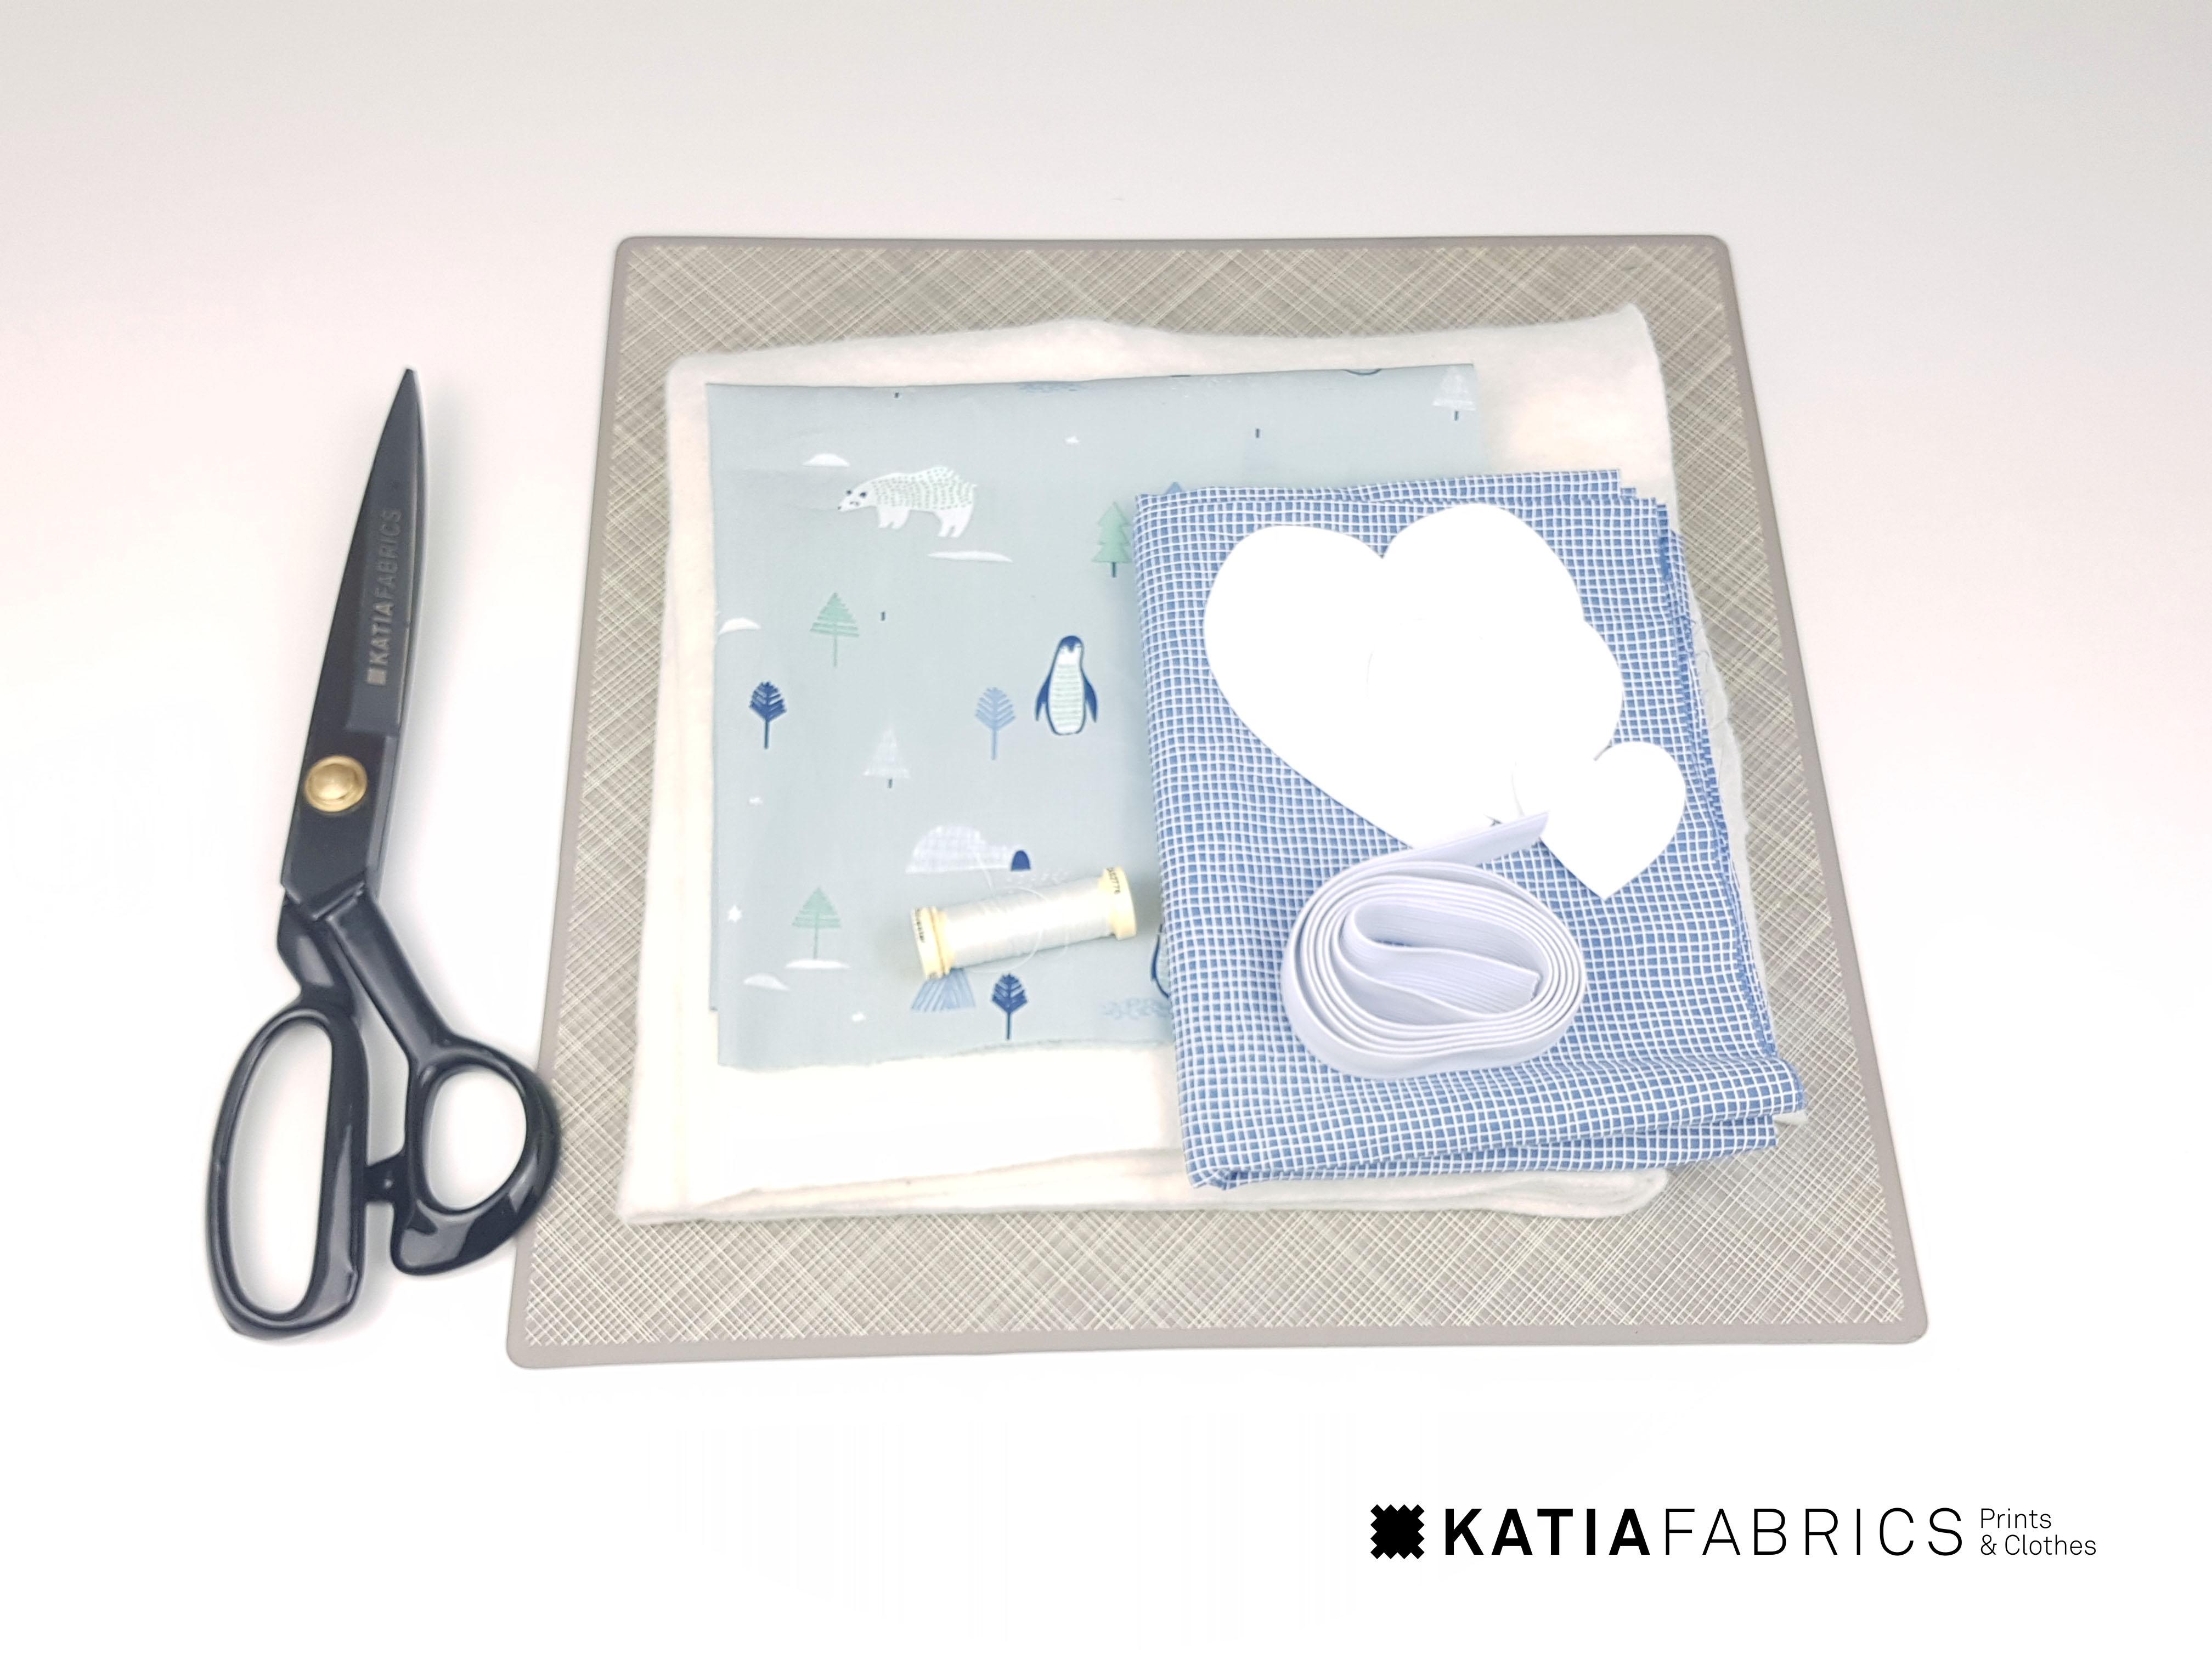 KatiaFabrics-Tischset-Serviettenring-Material